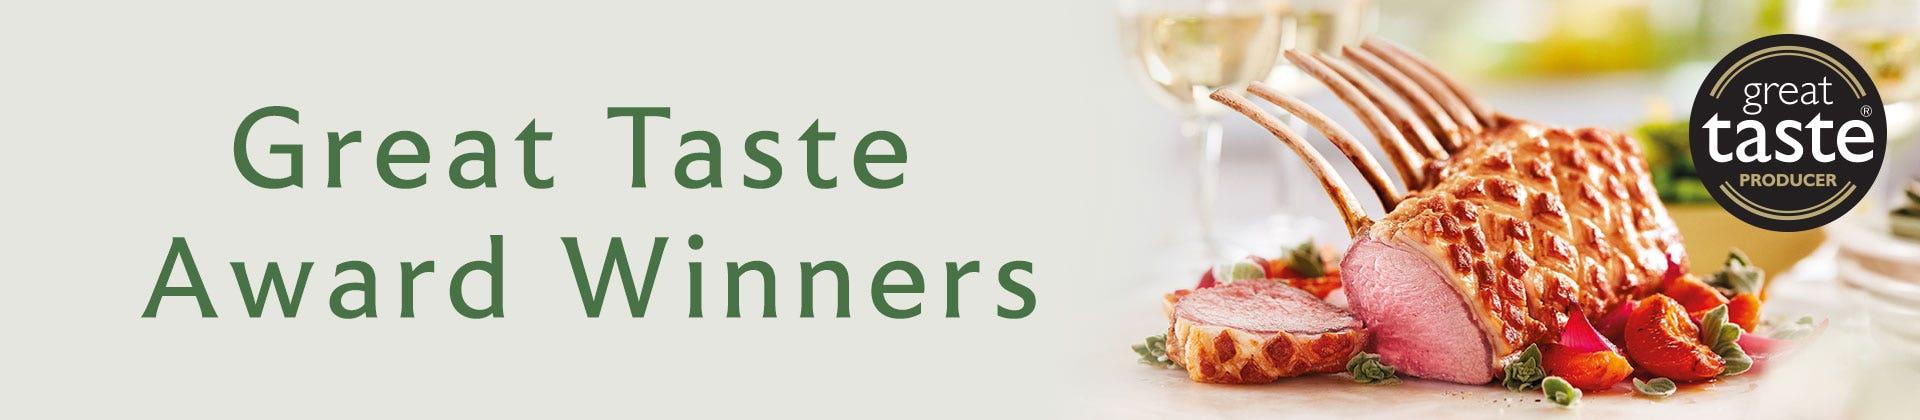 Great Taste Award Winners - Lamb Rack